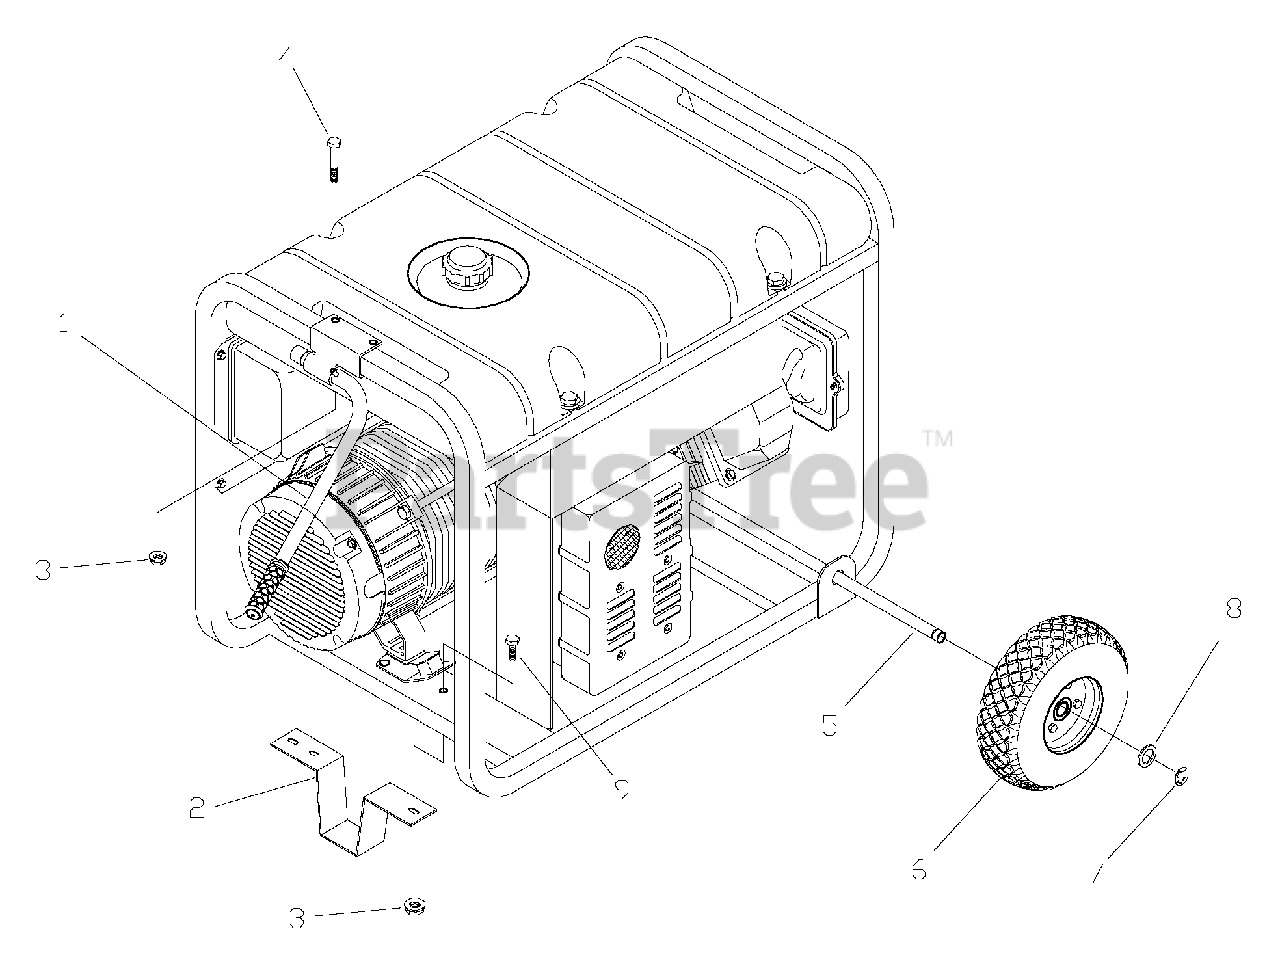 Troy-bilt Parts On The Wheel Kit Diagram For 1919-1